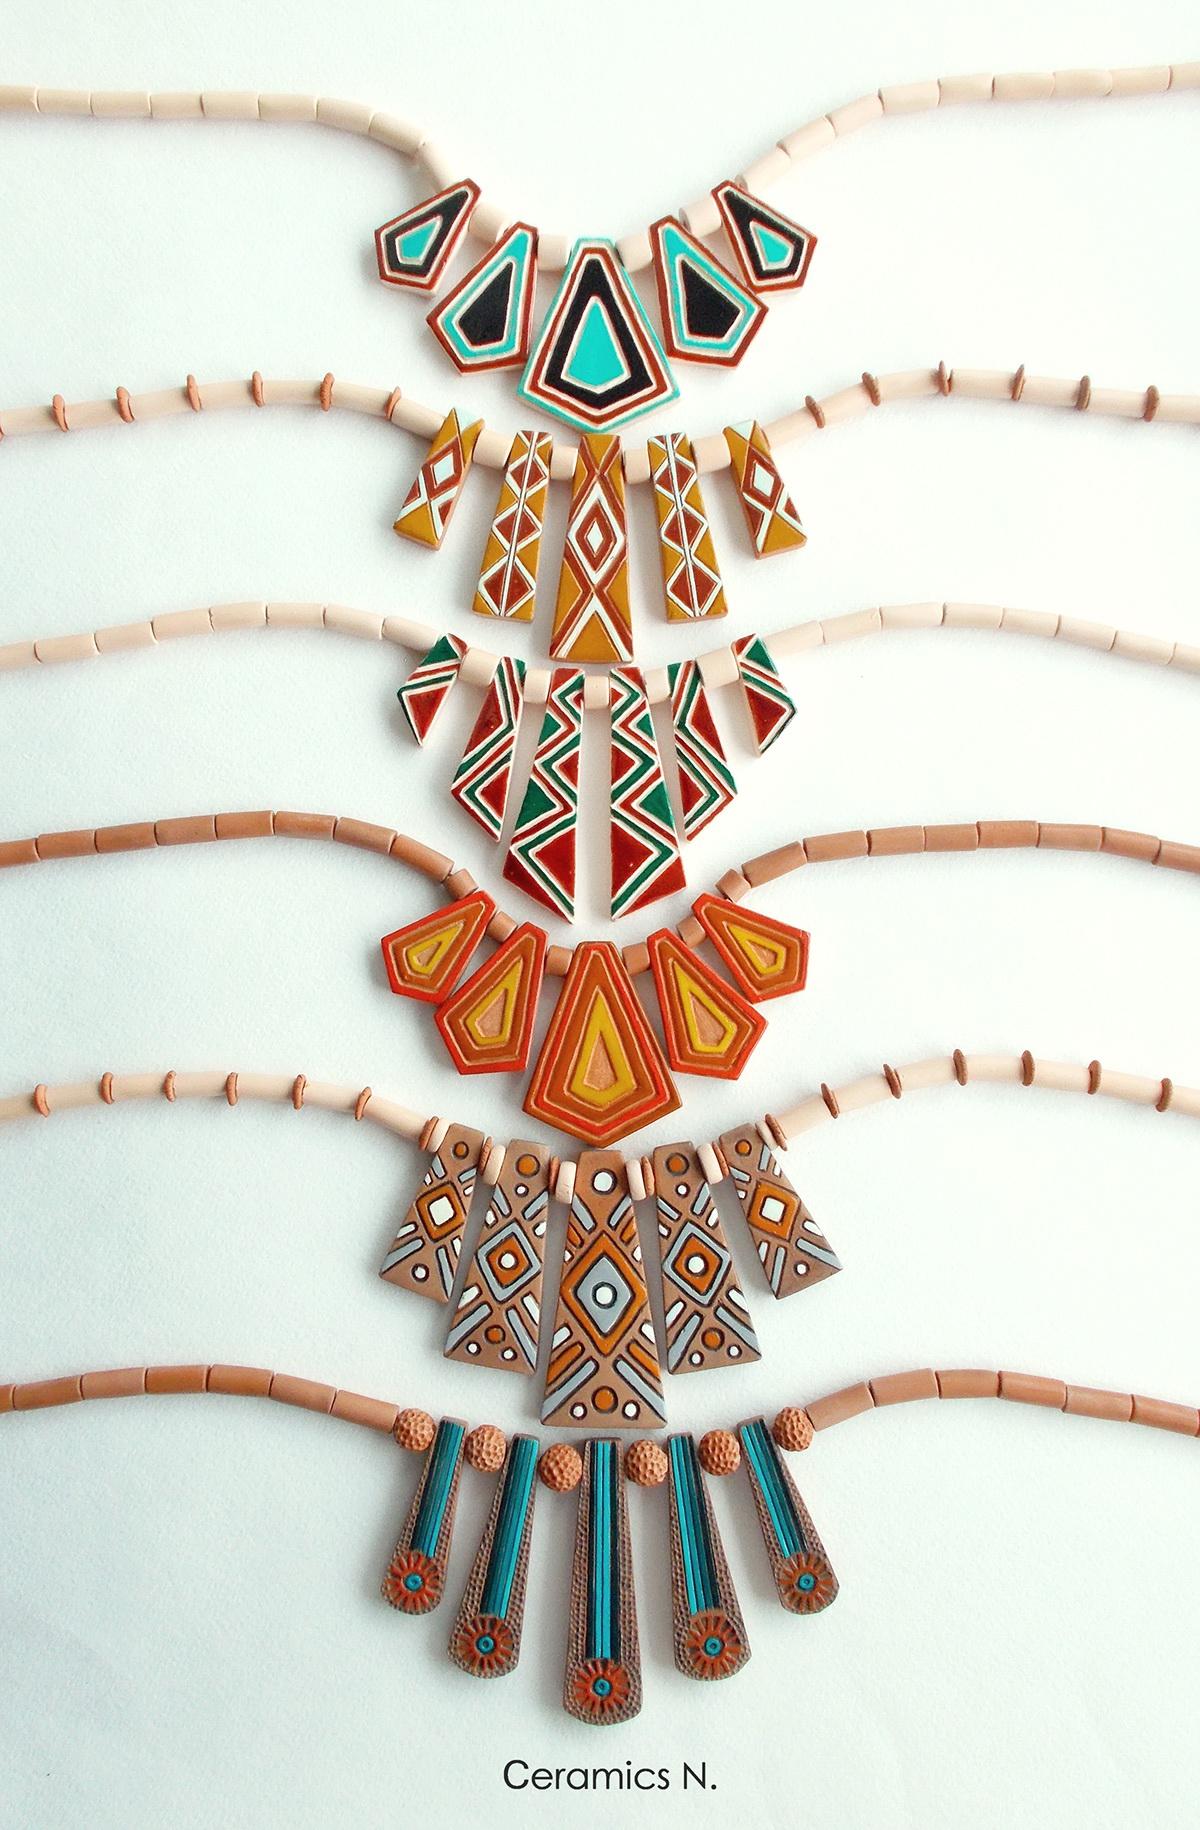 Ceramic necklases, jewelry design by Nadiia Ambroziak